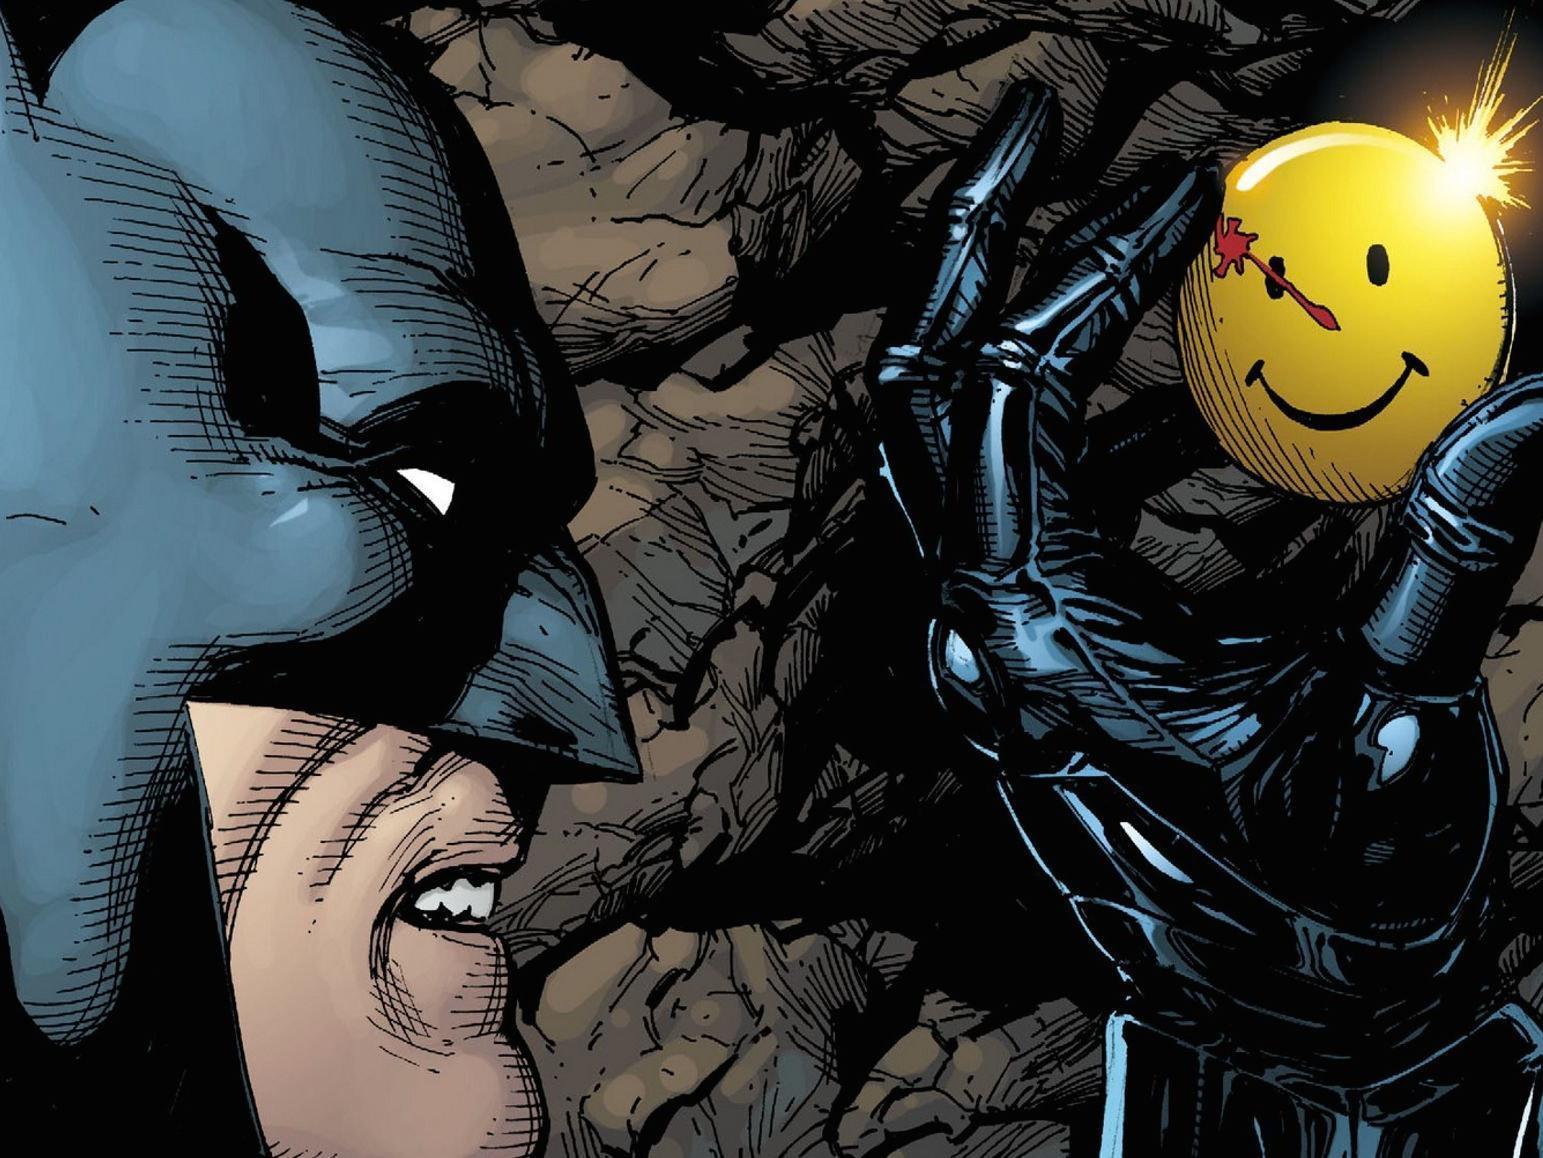 DC's 'Rebirth Deluxe' Includes More Watchmen